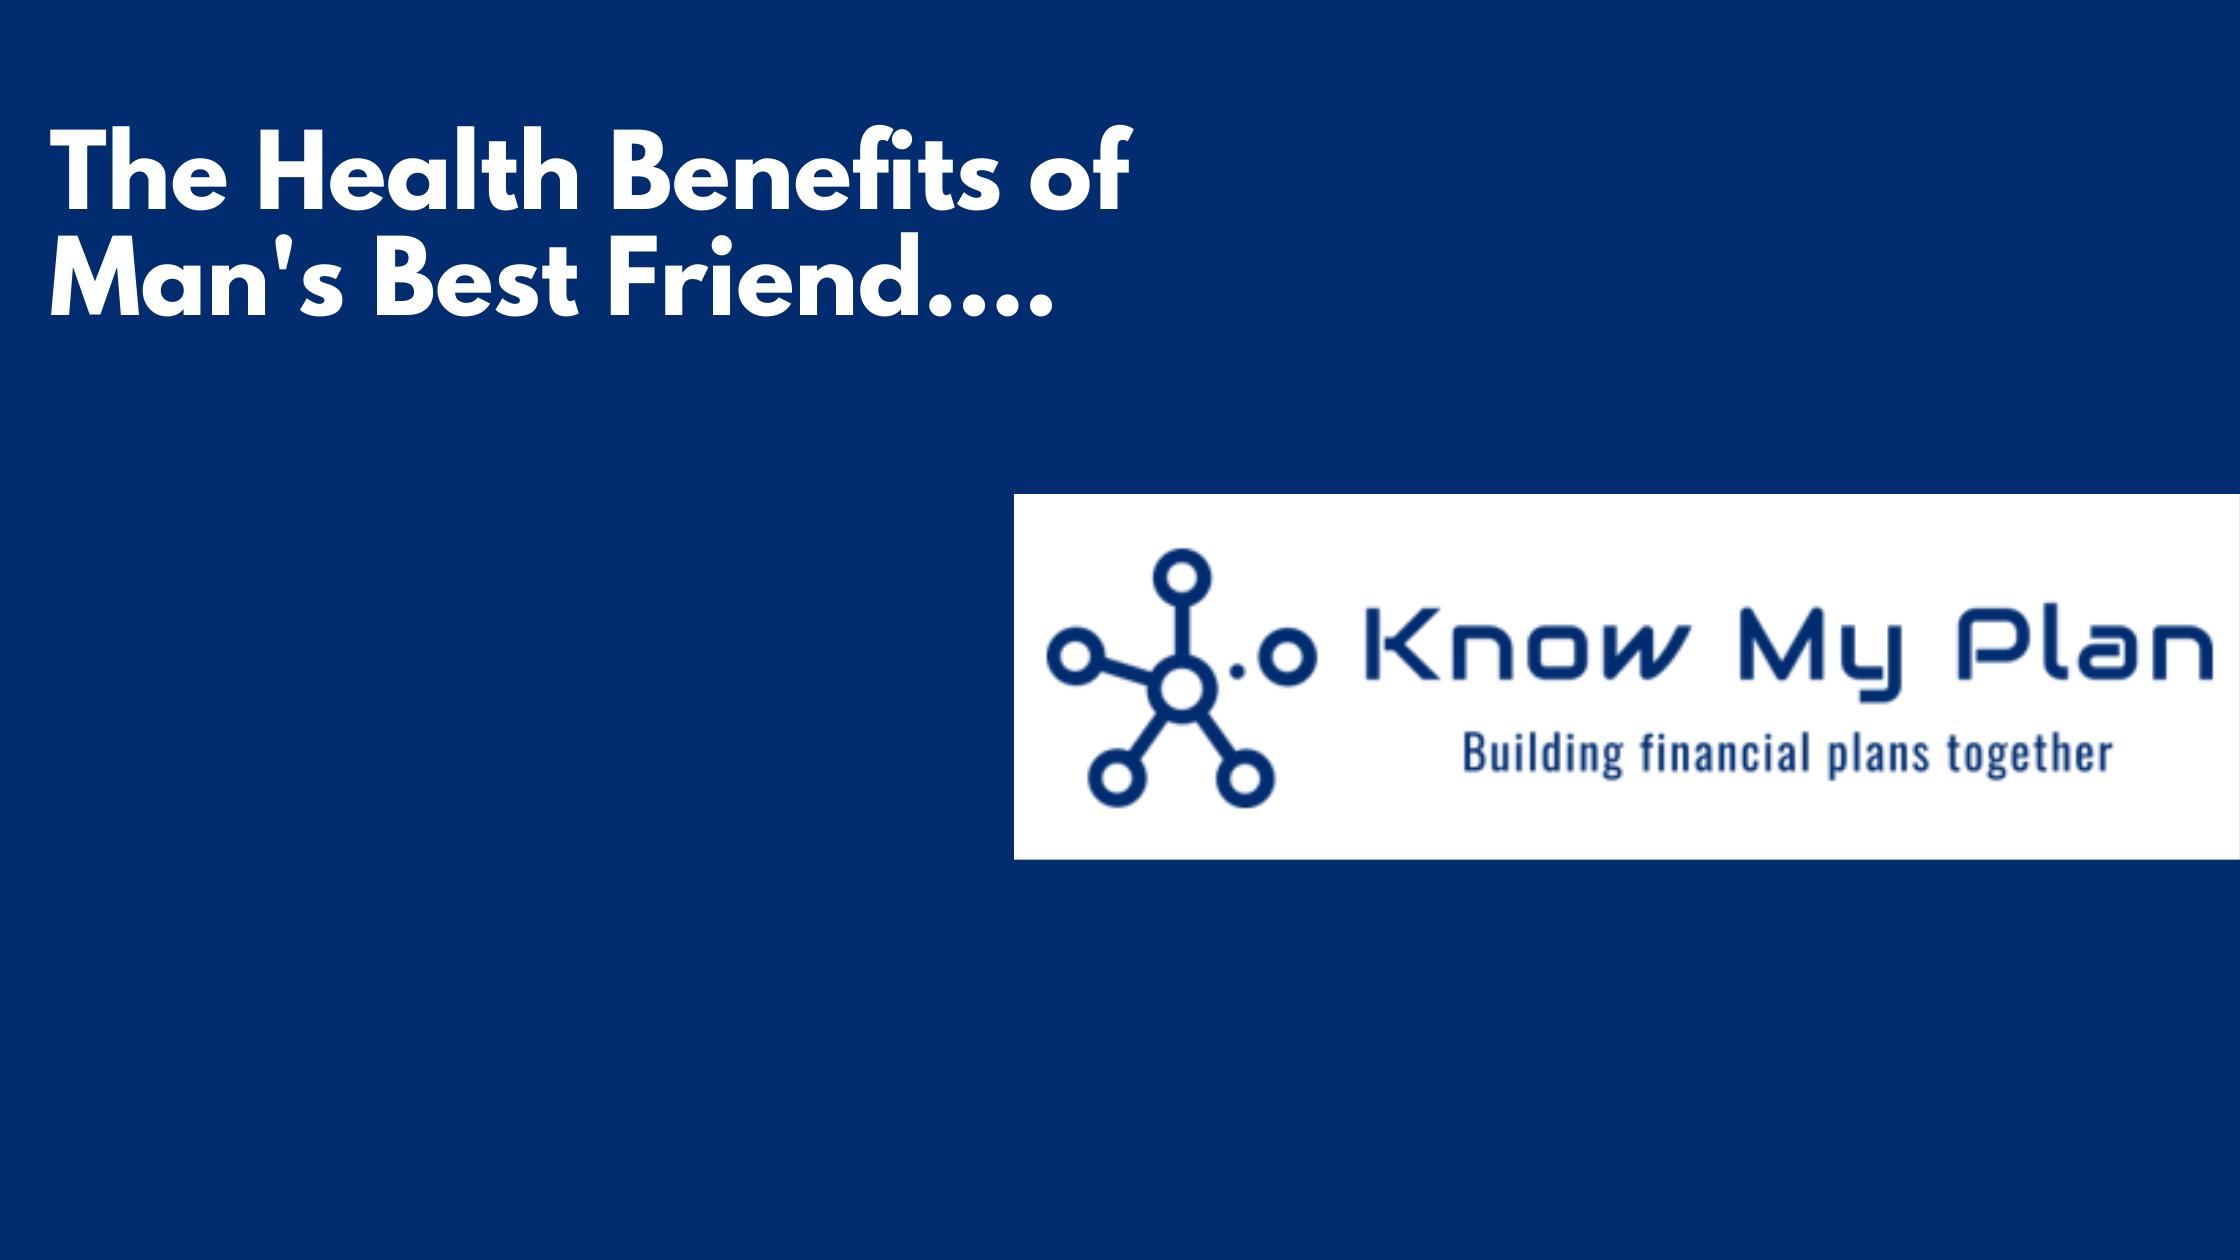 The Health Benefits of Mans Best Friend